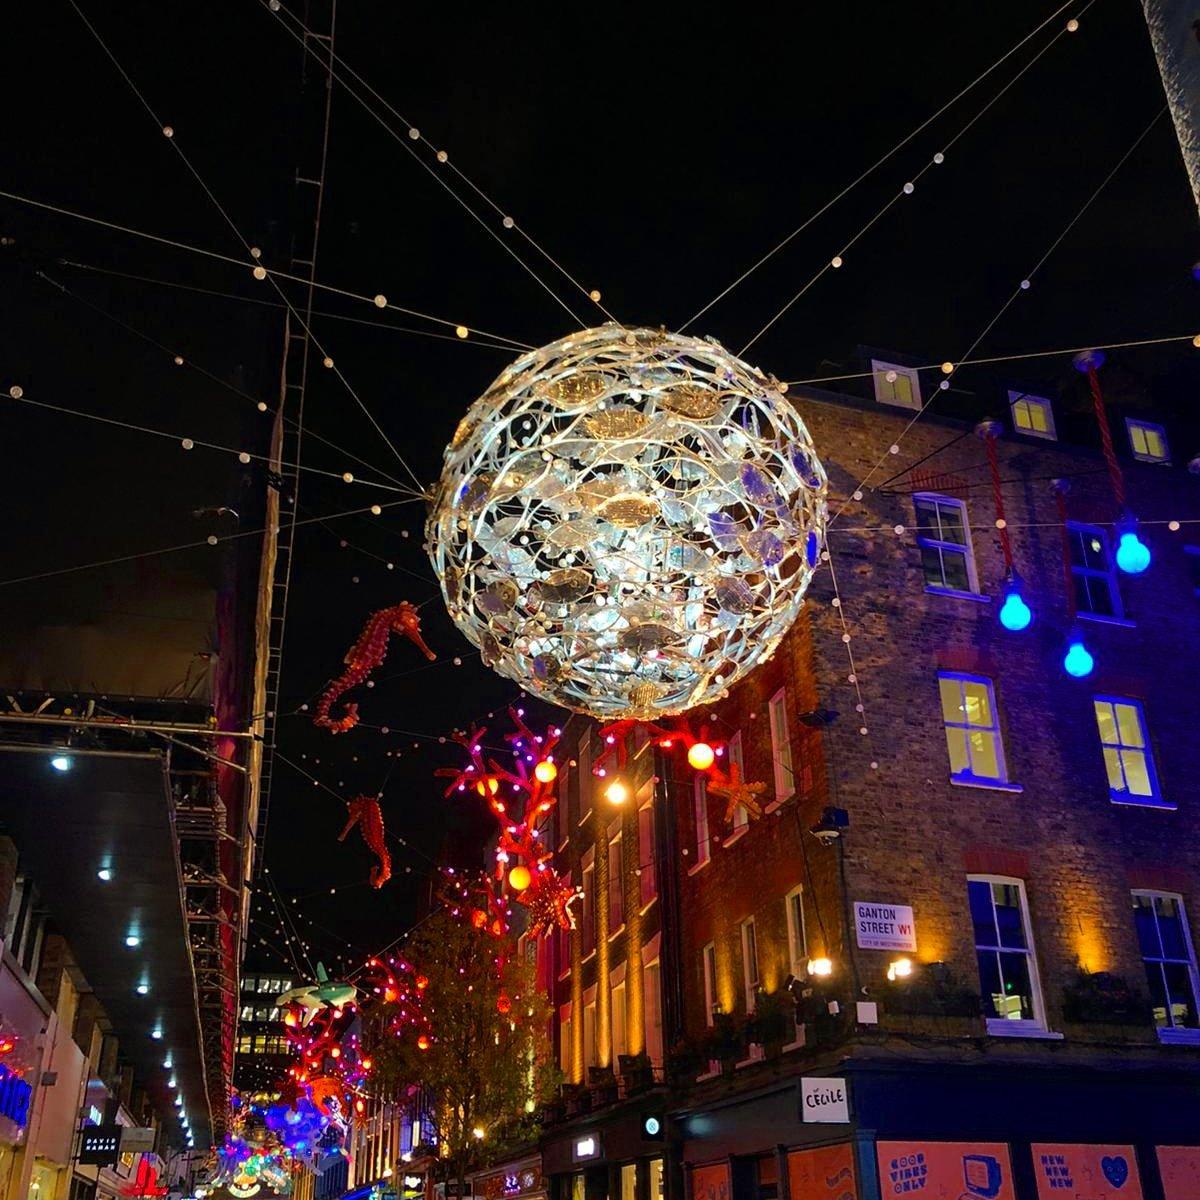 Christmas on Carnaby Street🎅 Happy Sunday! #christmas #carnabystreet #london https://t.co/XpwePmmBPI